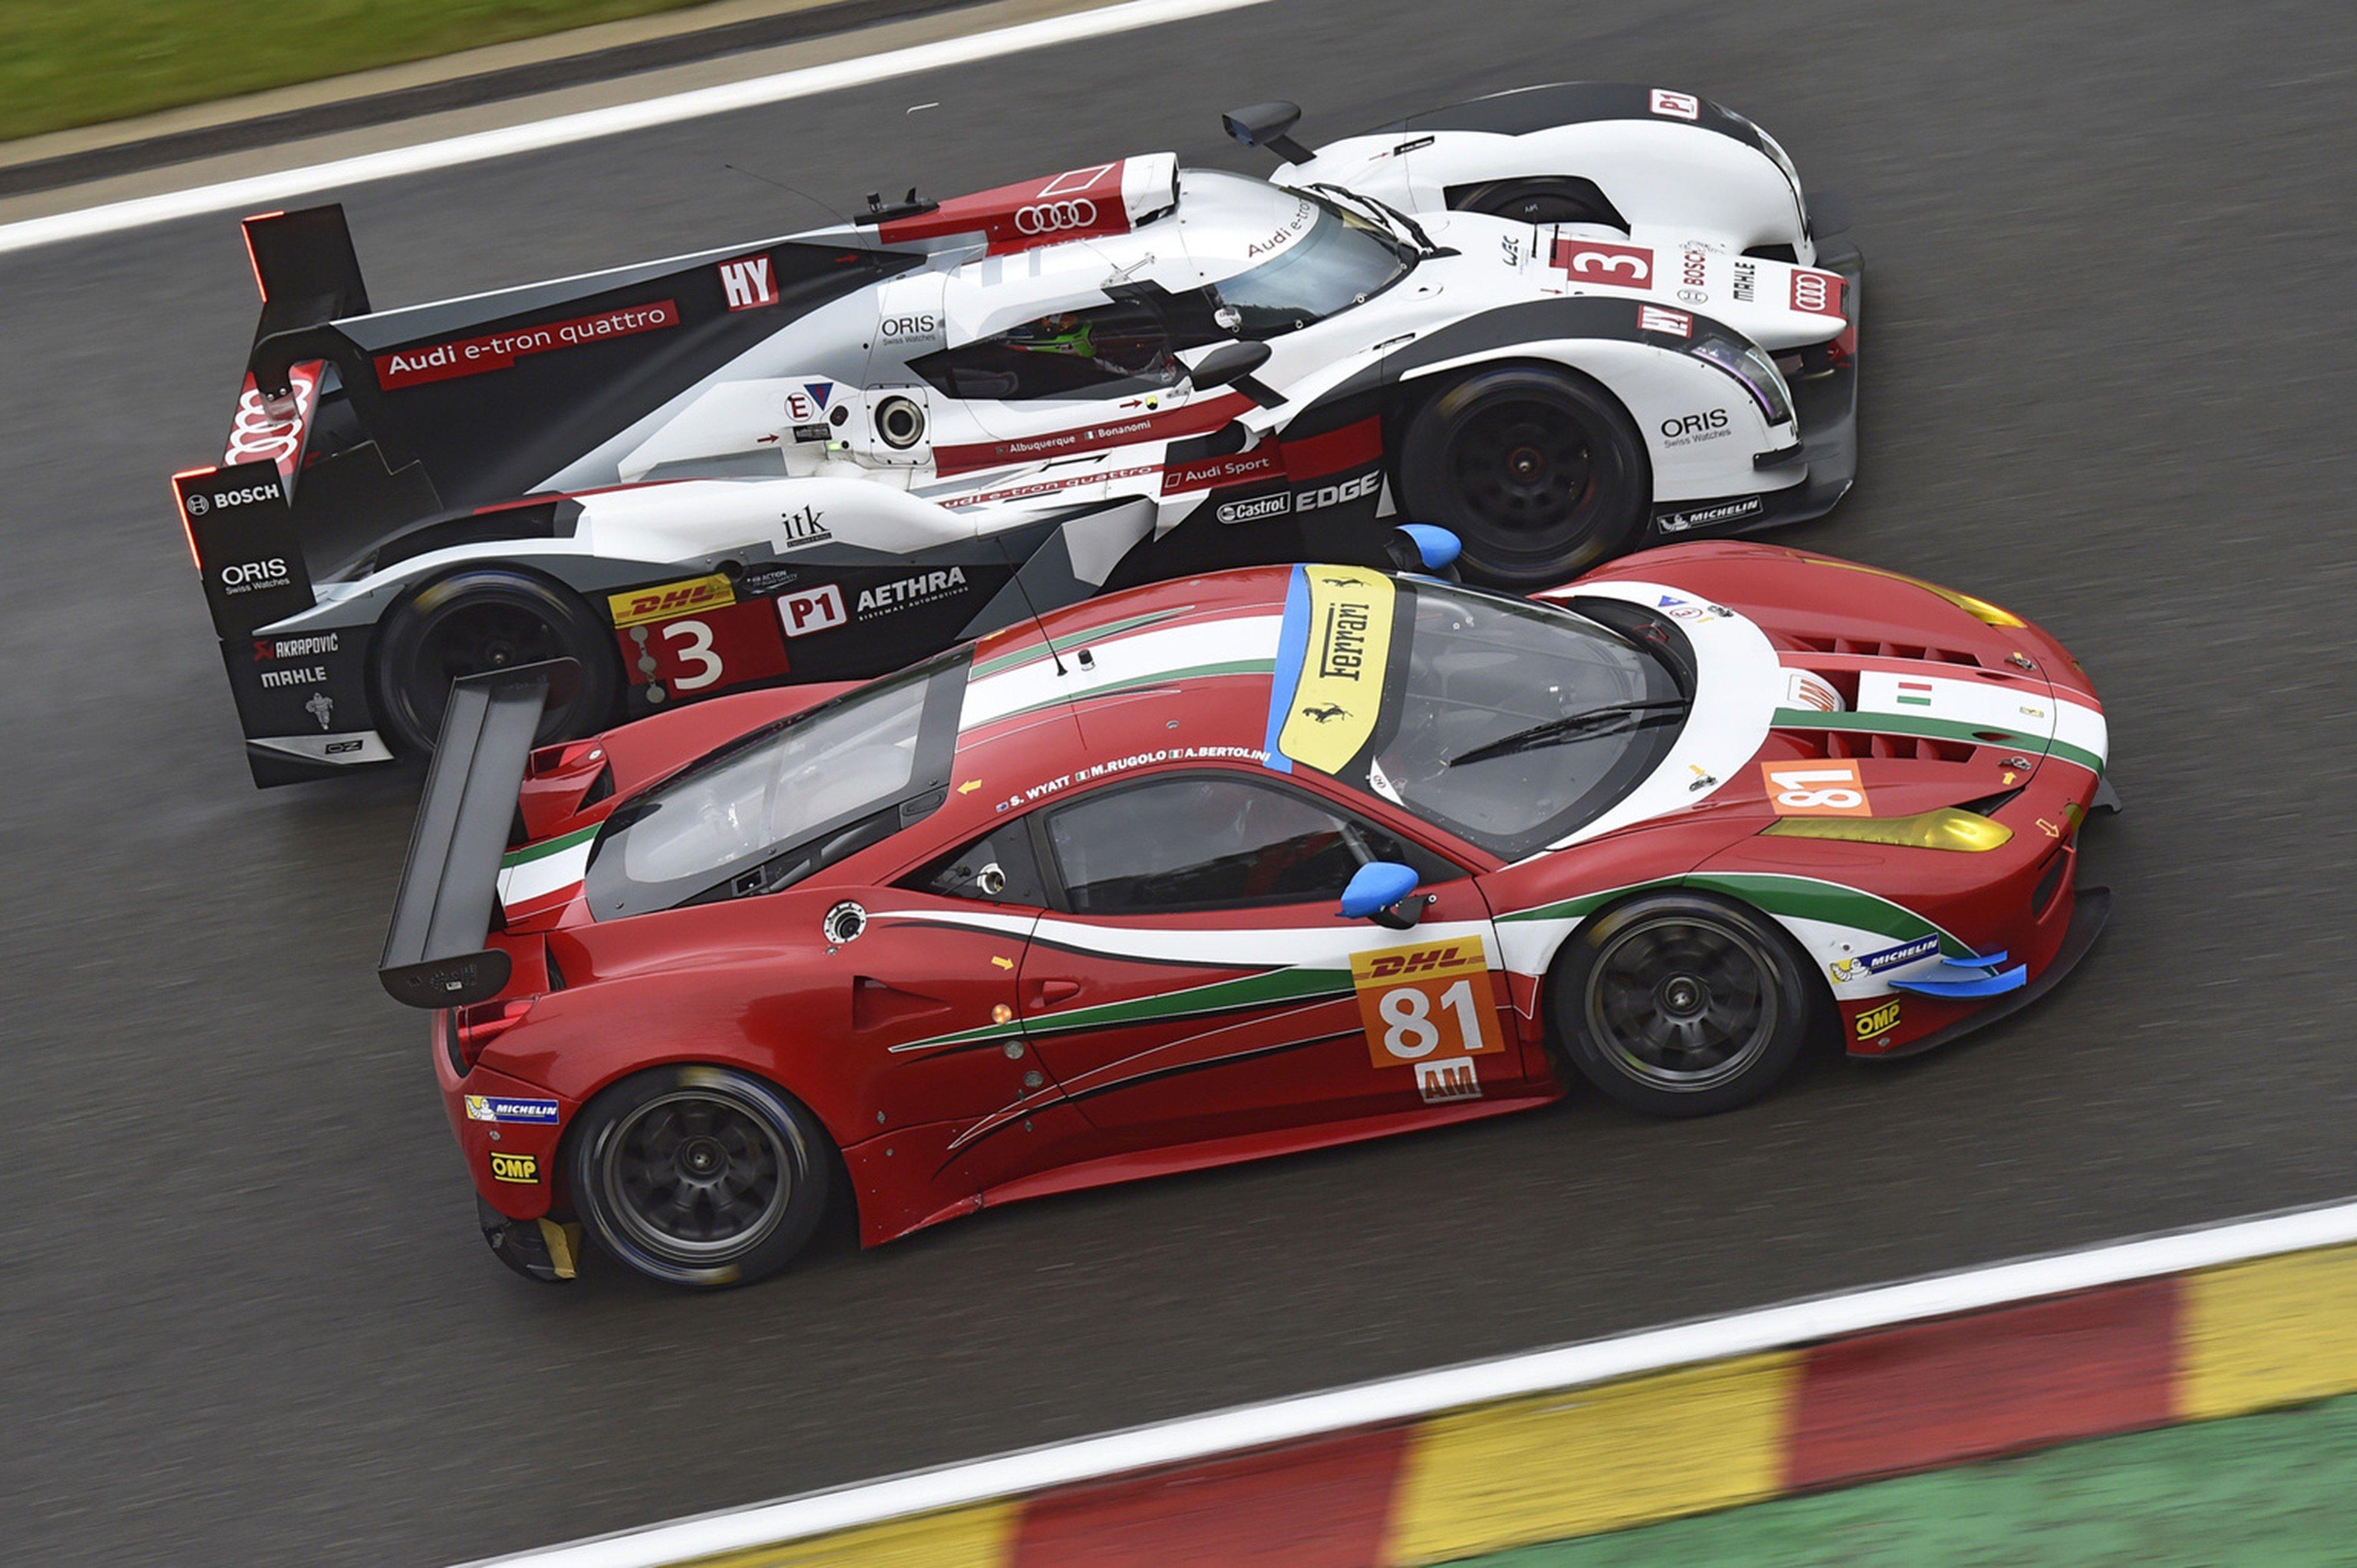 2014 Wec 6 Heures De Spa Francorchamps Car Race Belgium